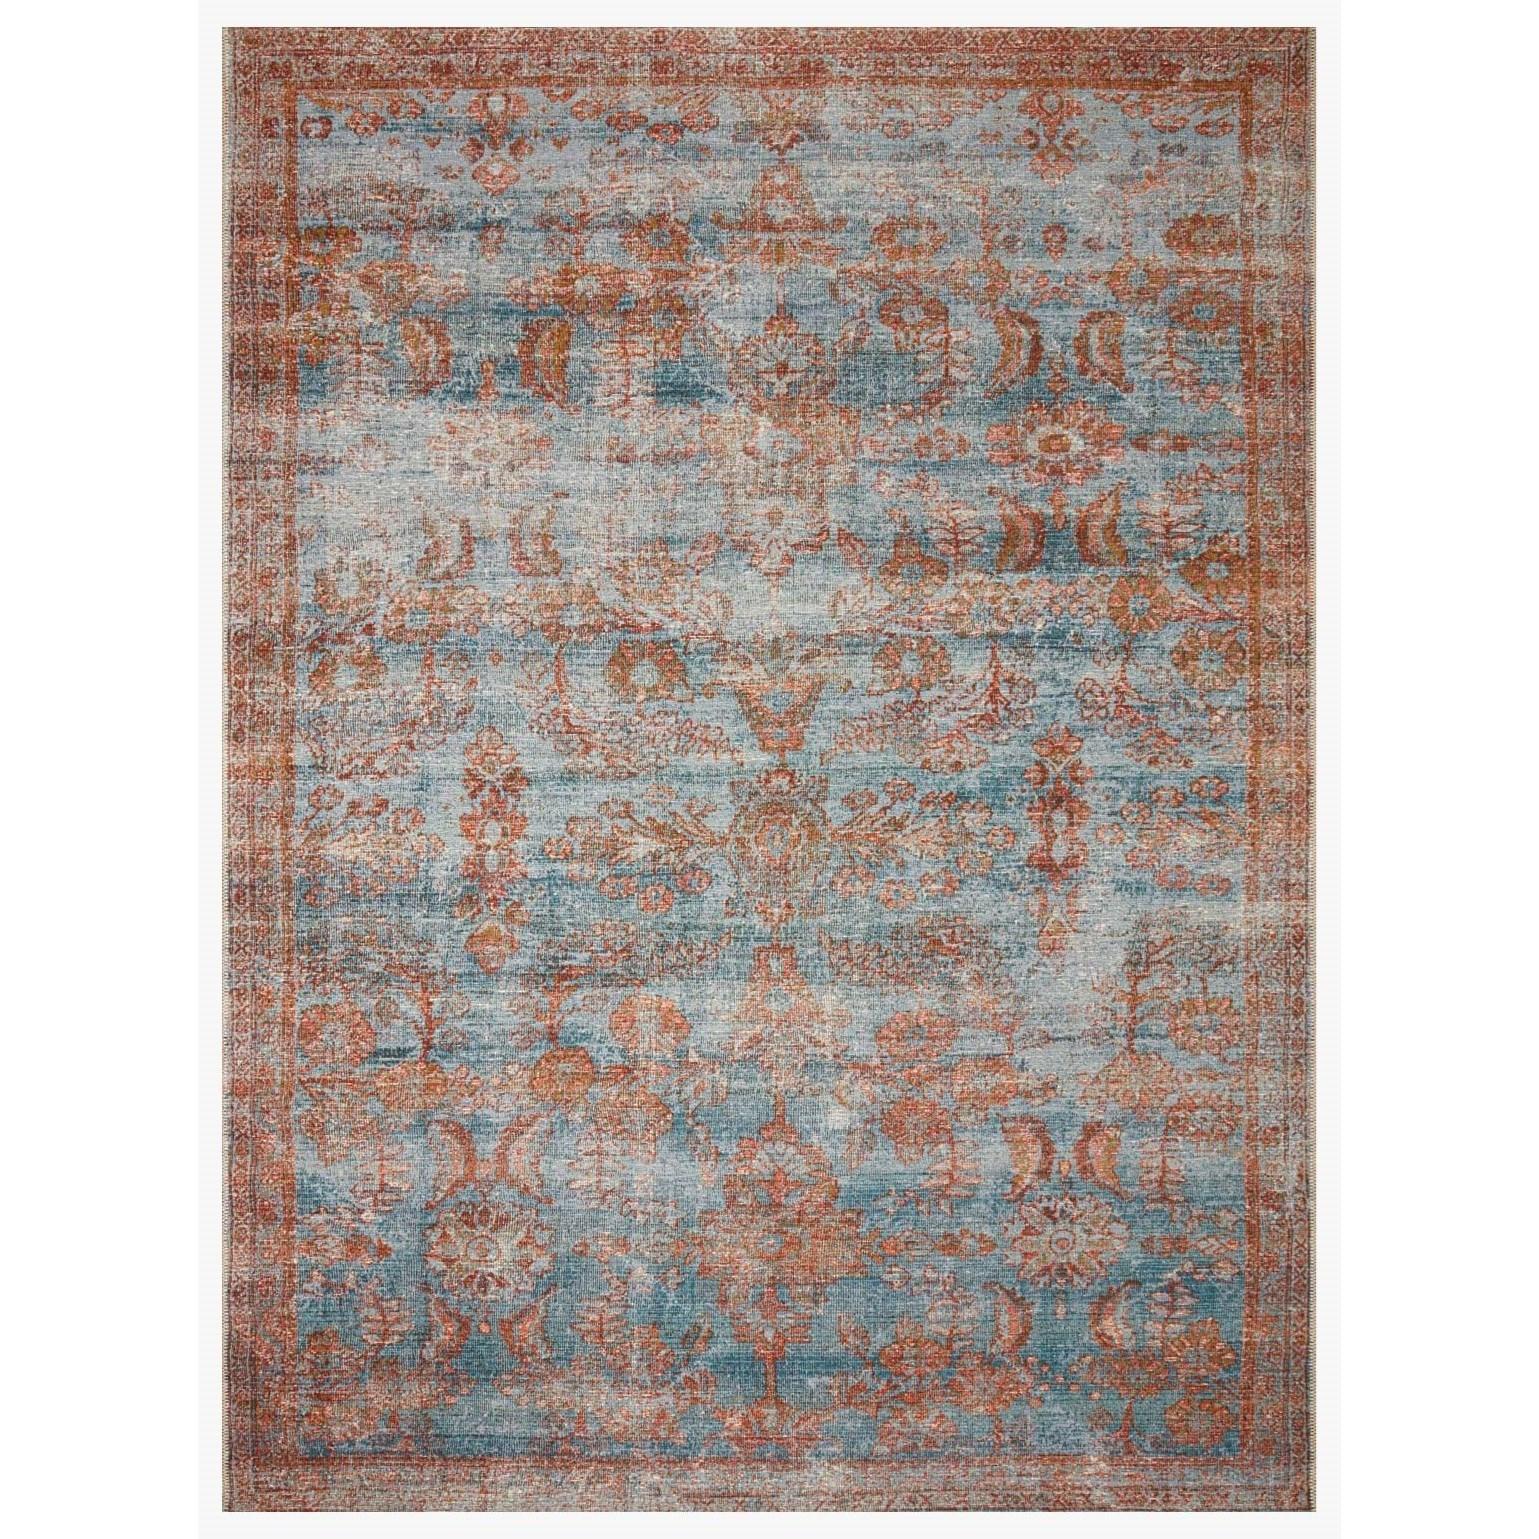 "Sebastian 3'11"" x 5'11"" Ocean / Spice Rug by Loloi Rugs at Virginia Furniture Market"